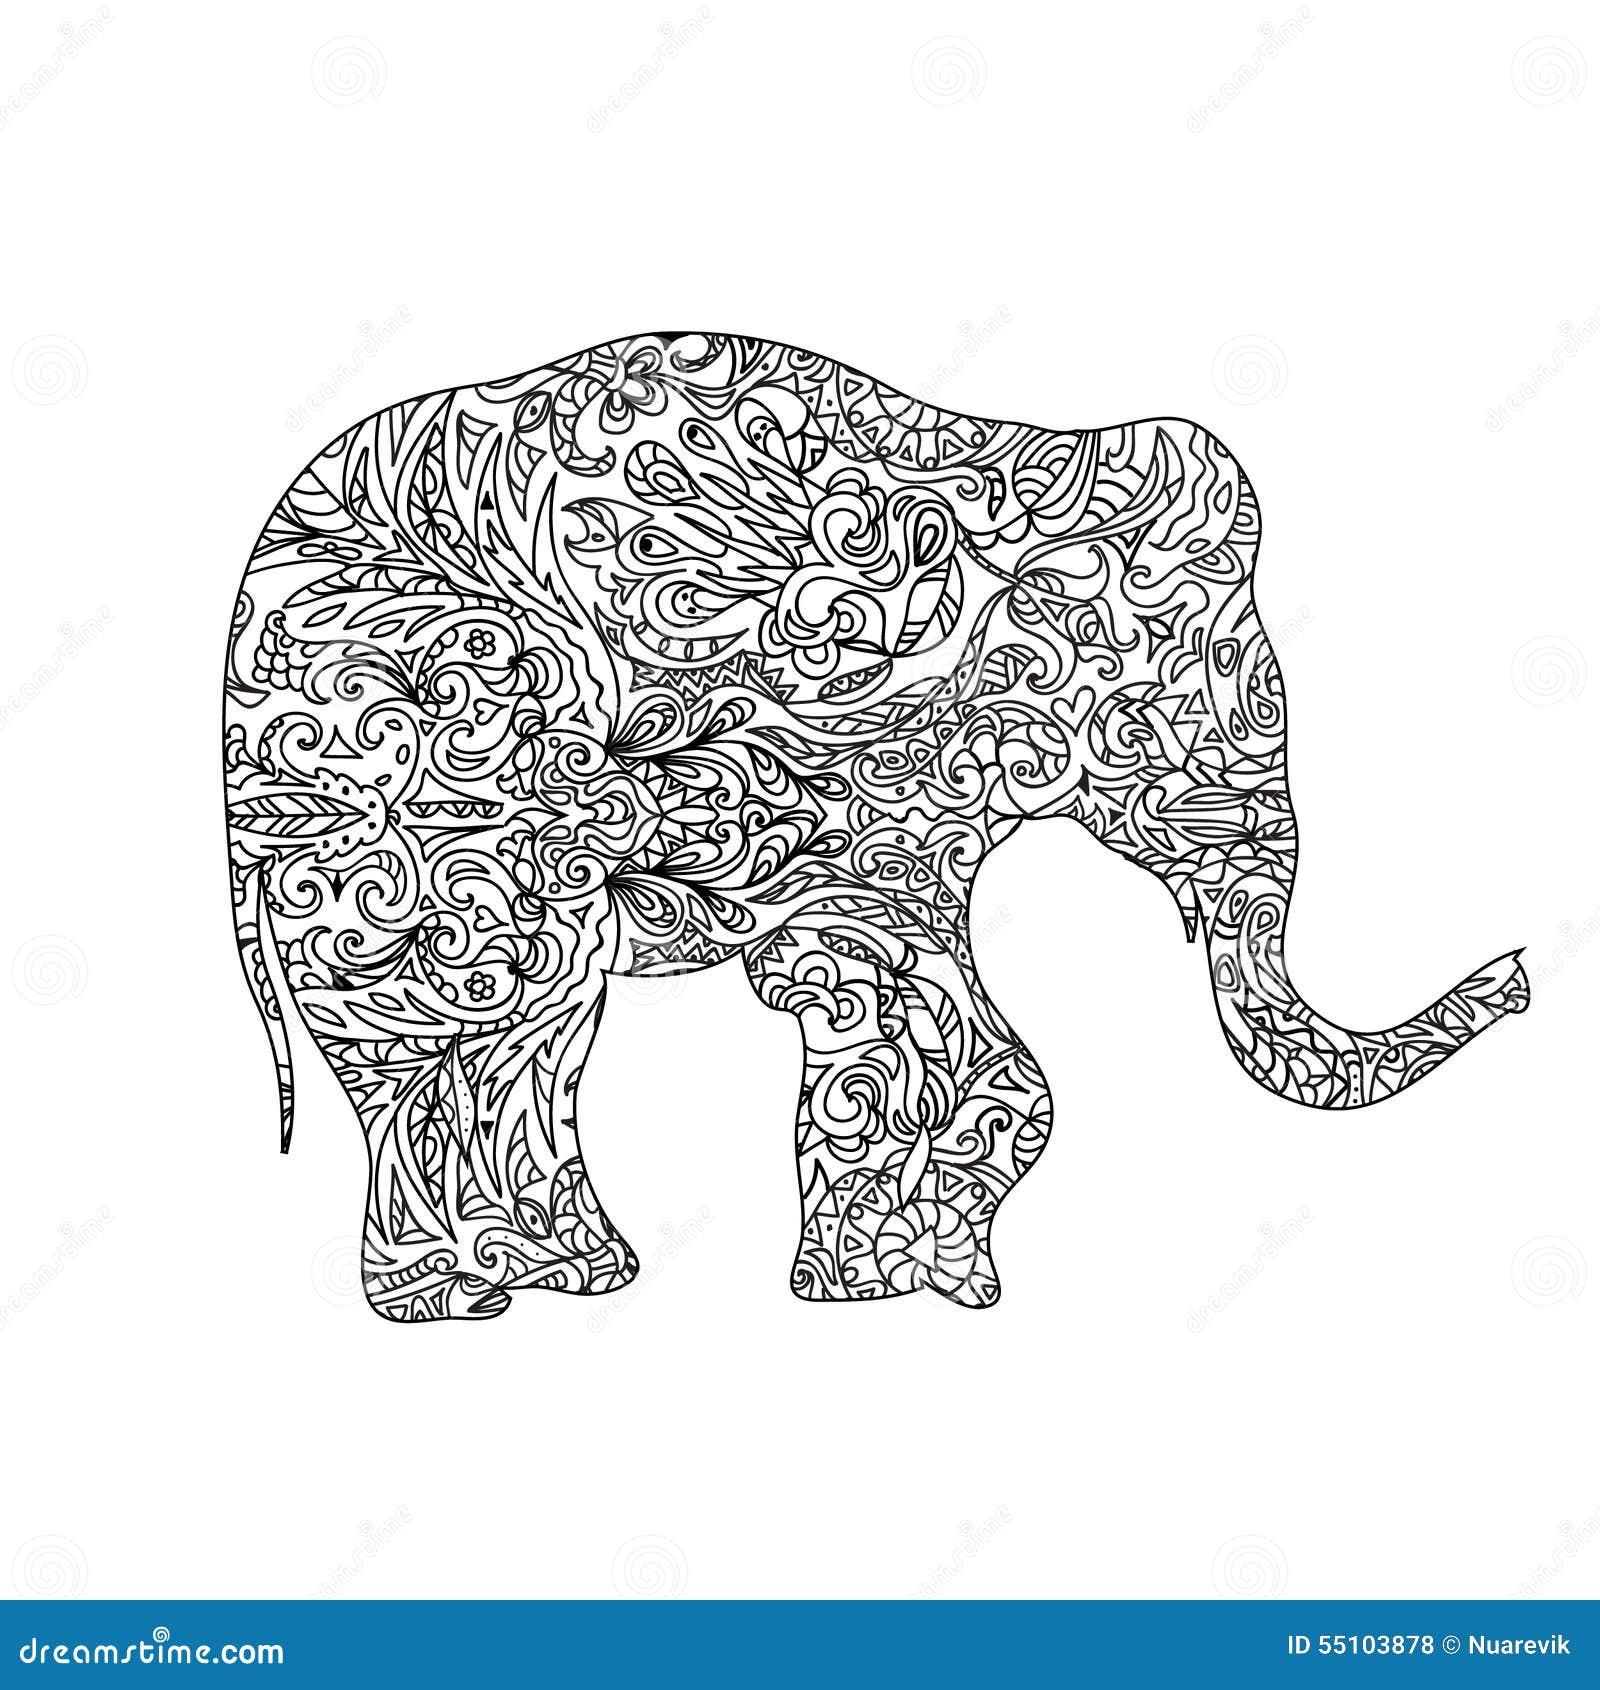 Elephant zentangle stock illustration. Illustration of wild - 55103878